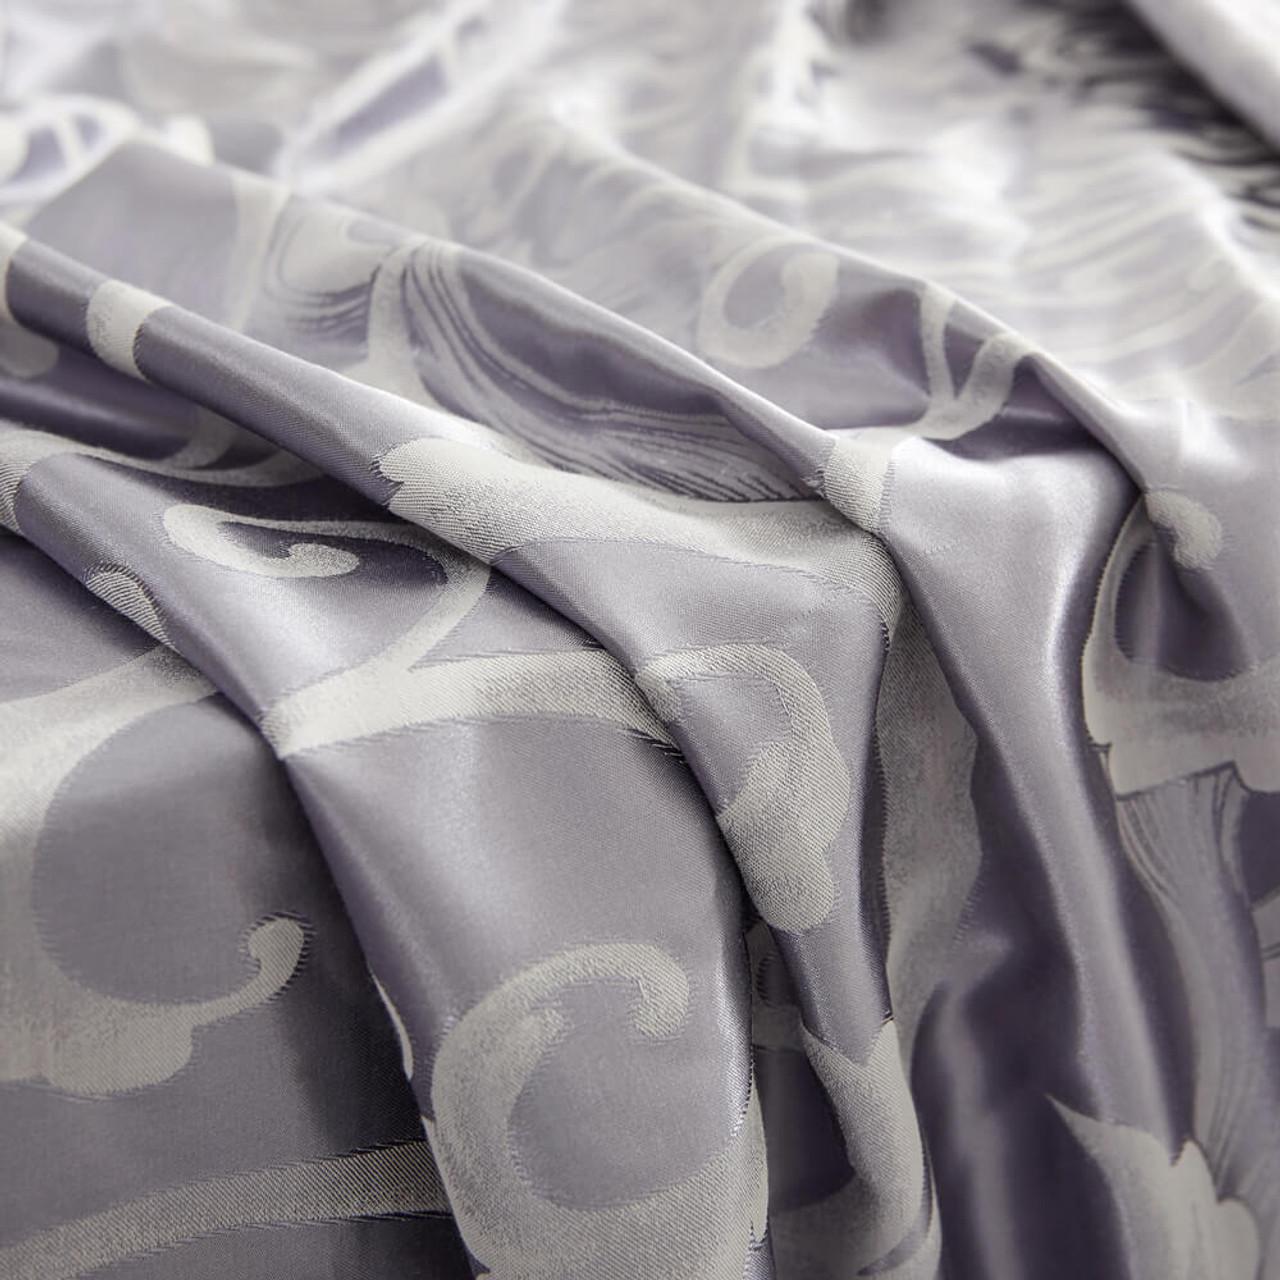 Curtain Panel Semi-Blackout Drapes 8171460151082 Drop-Shipping